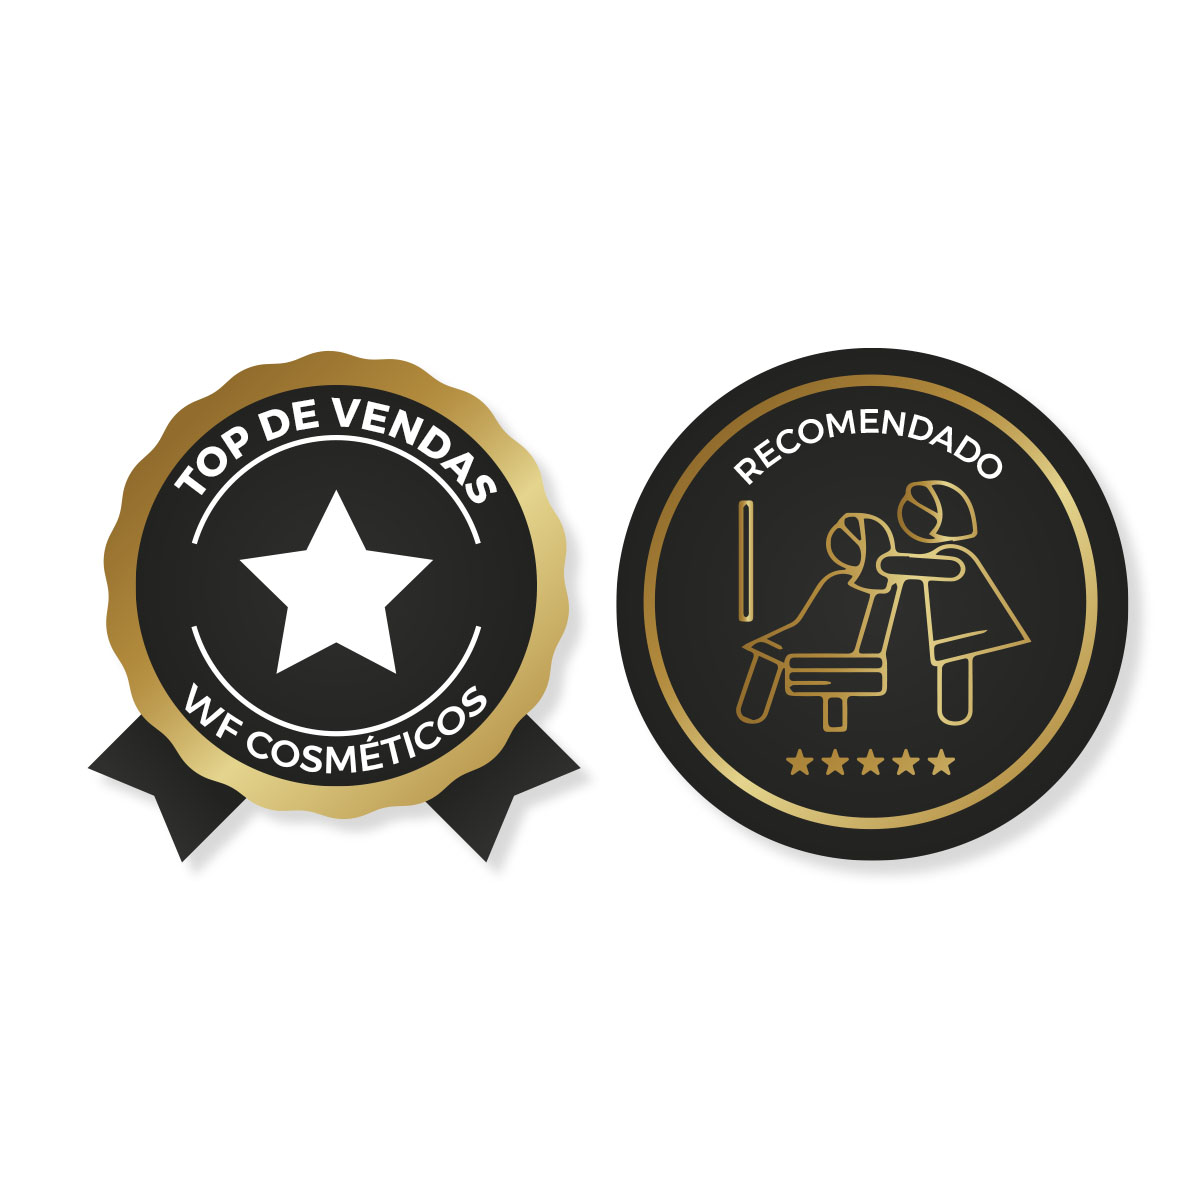 RENEW - SHAMPOO HAIR CAUTERIZATION WF COSMETICOS 1L